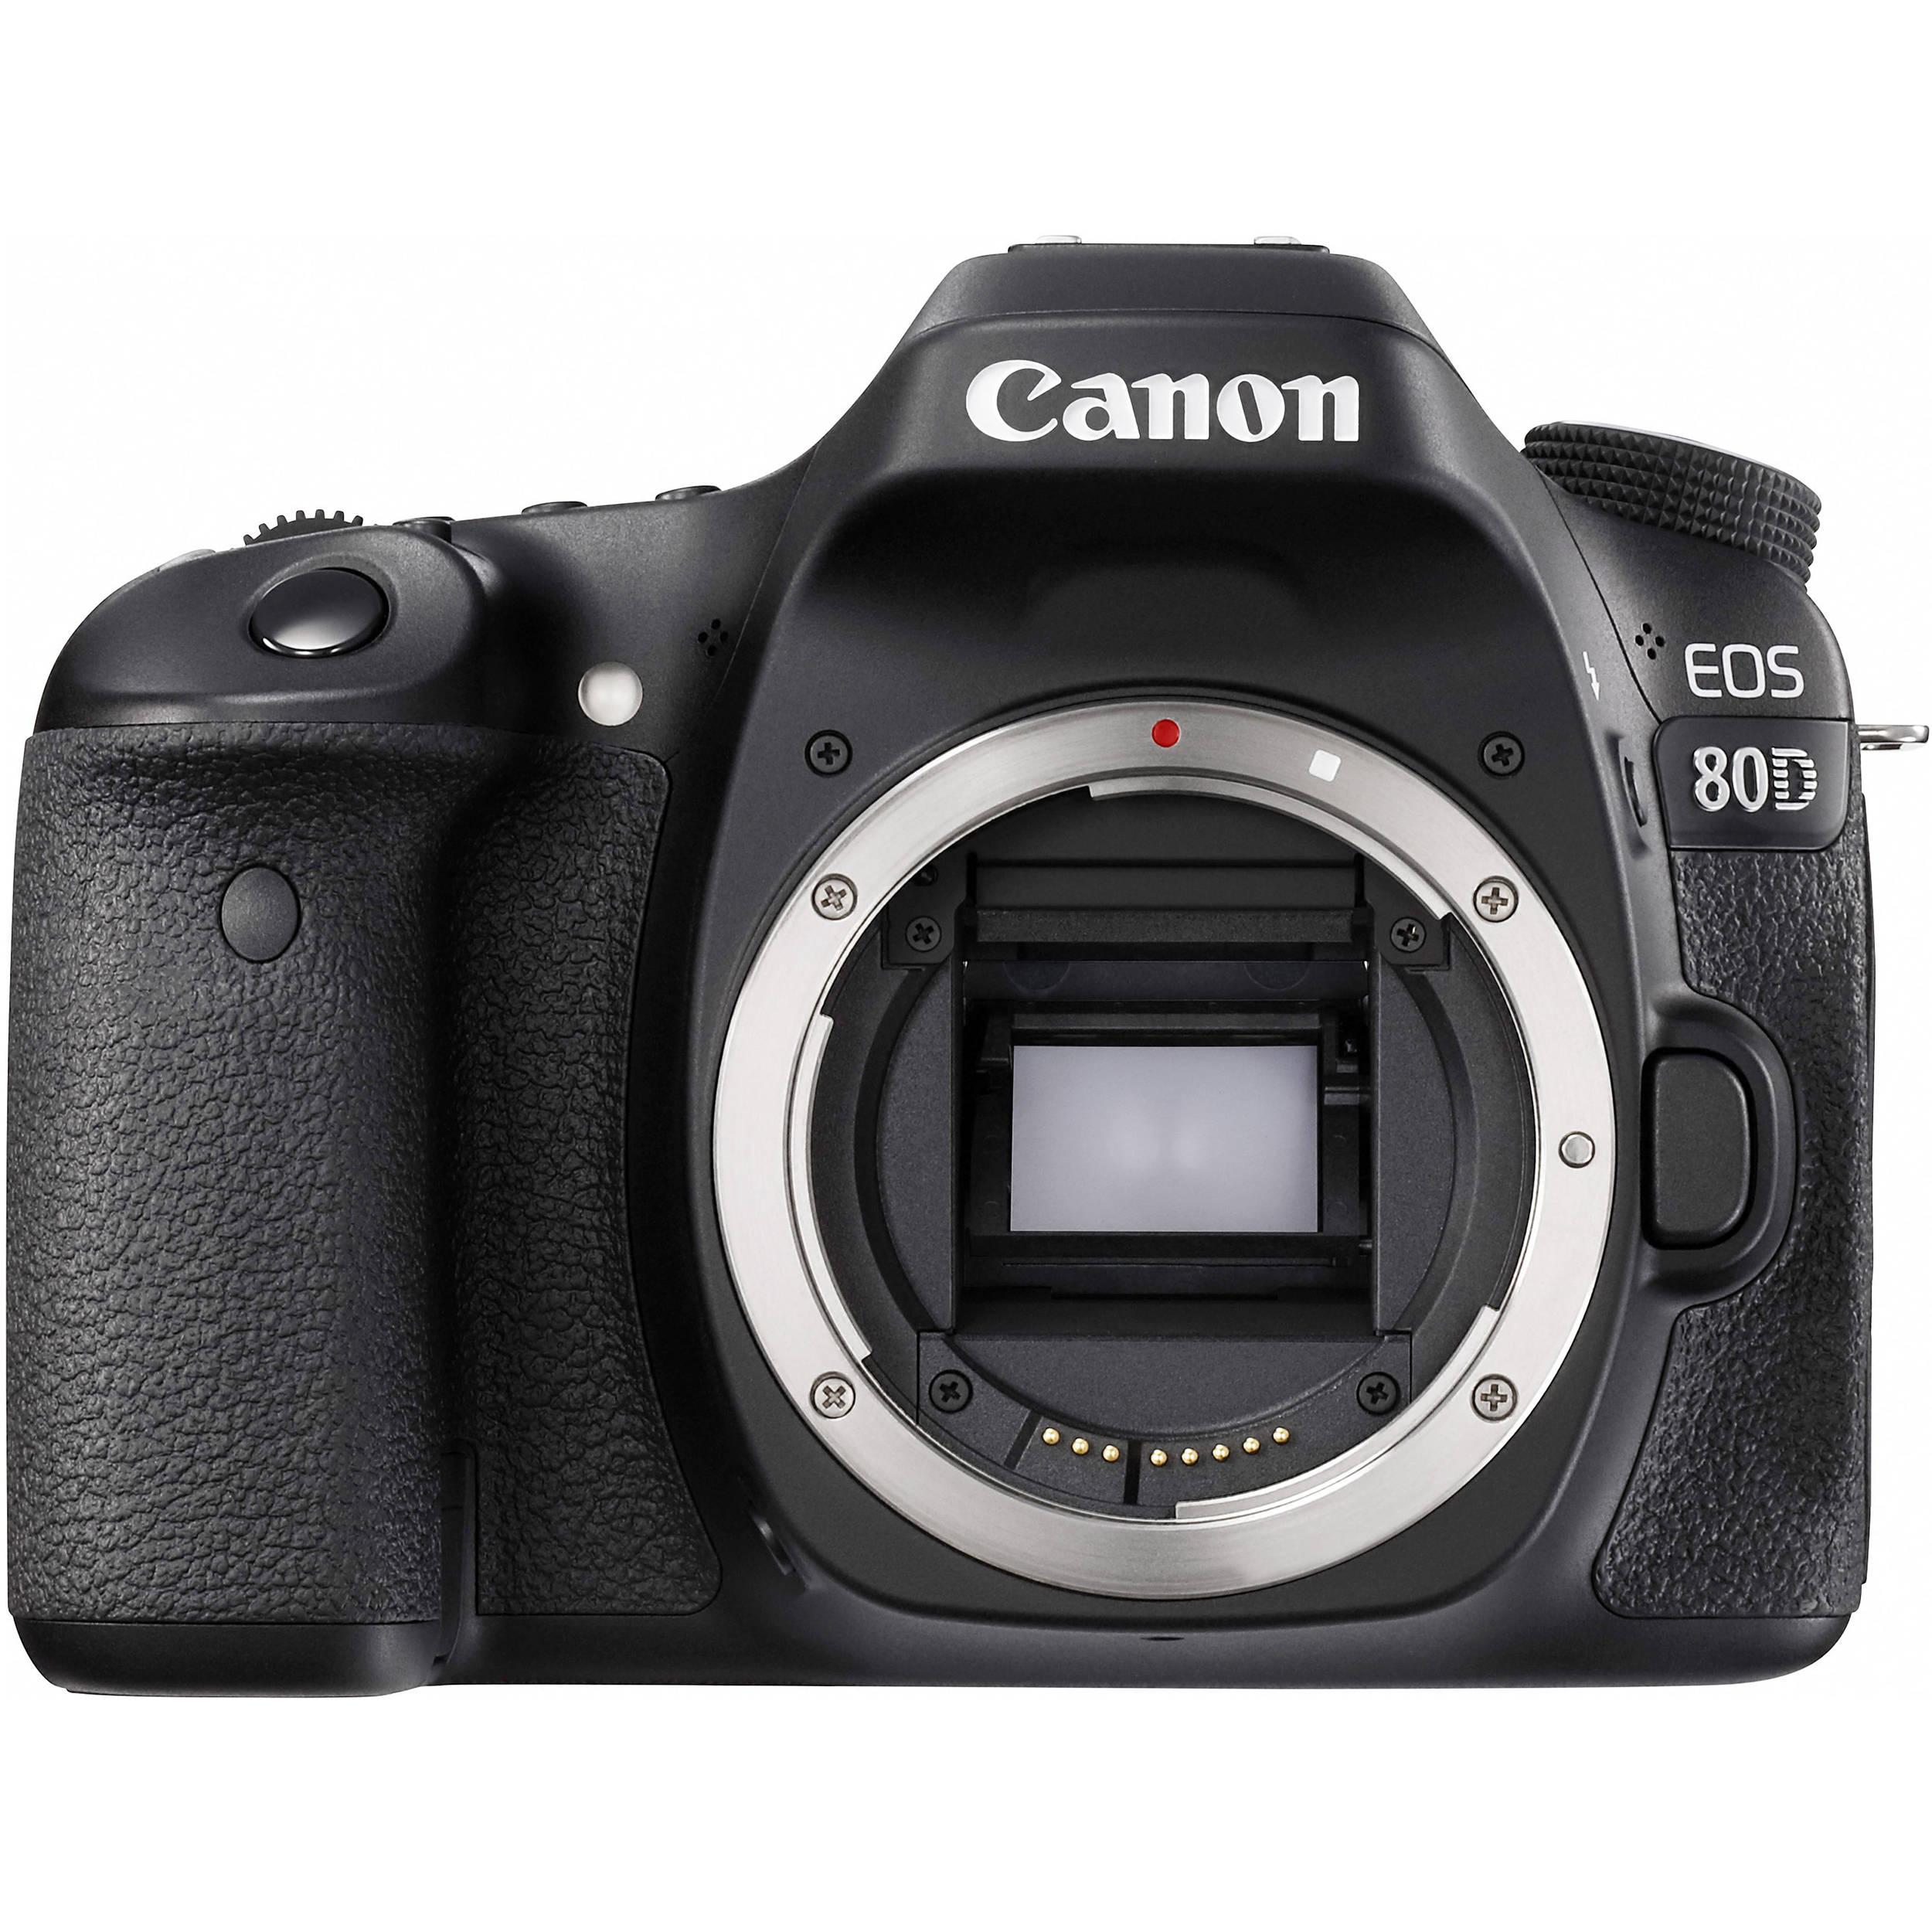 canon_1263c004_eos_80d_dslr_camera_1225875